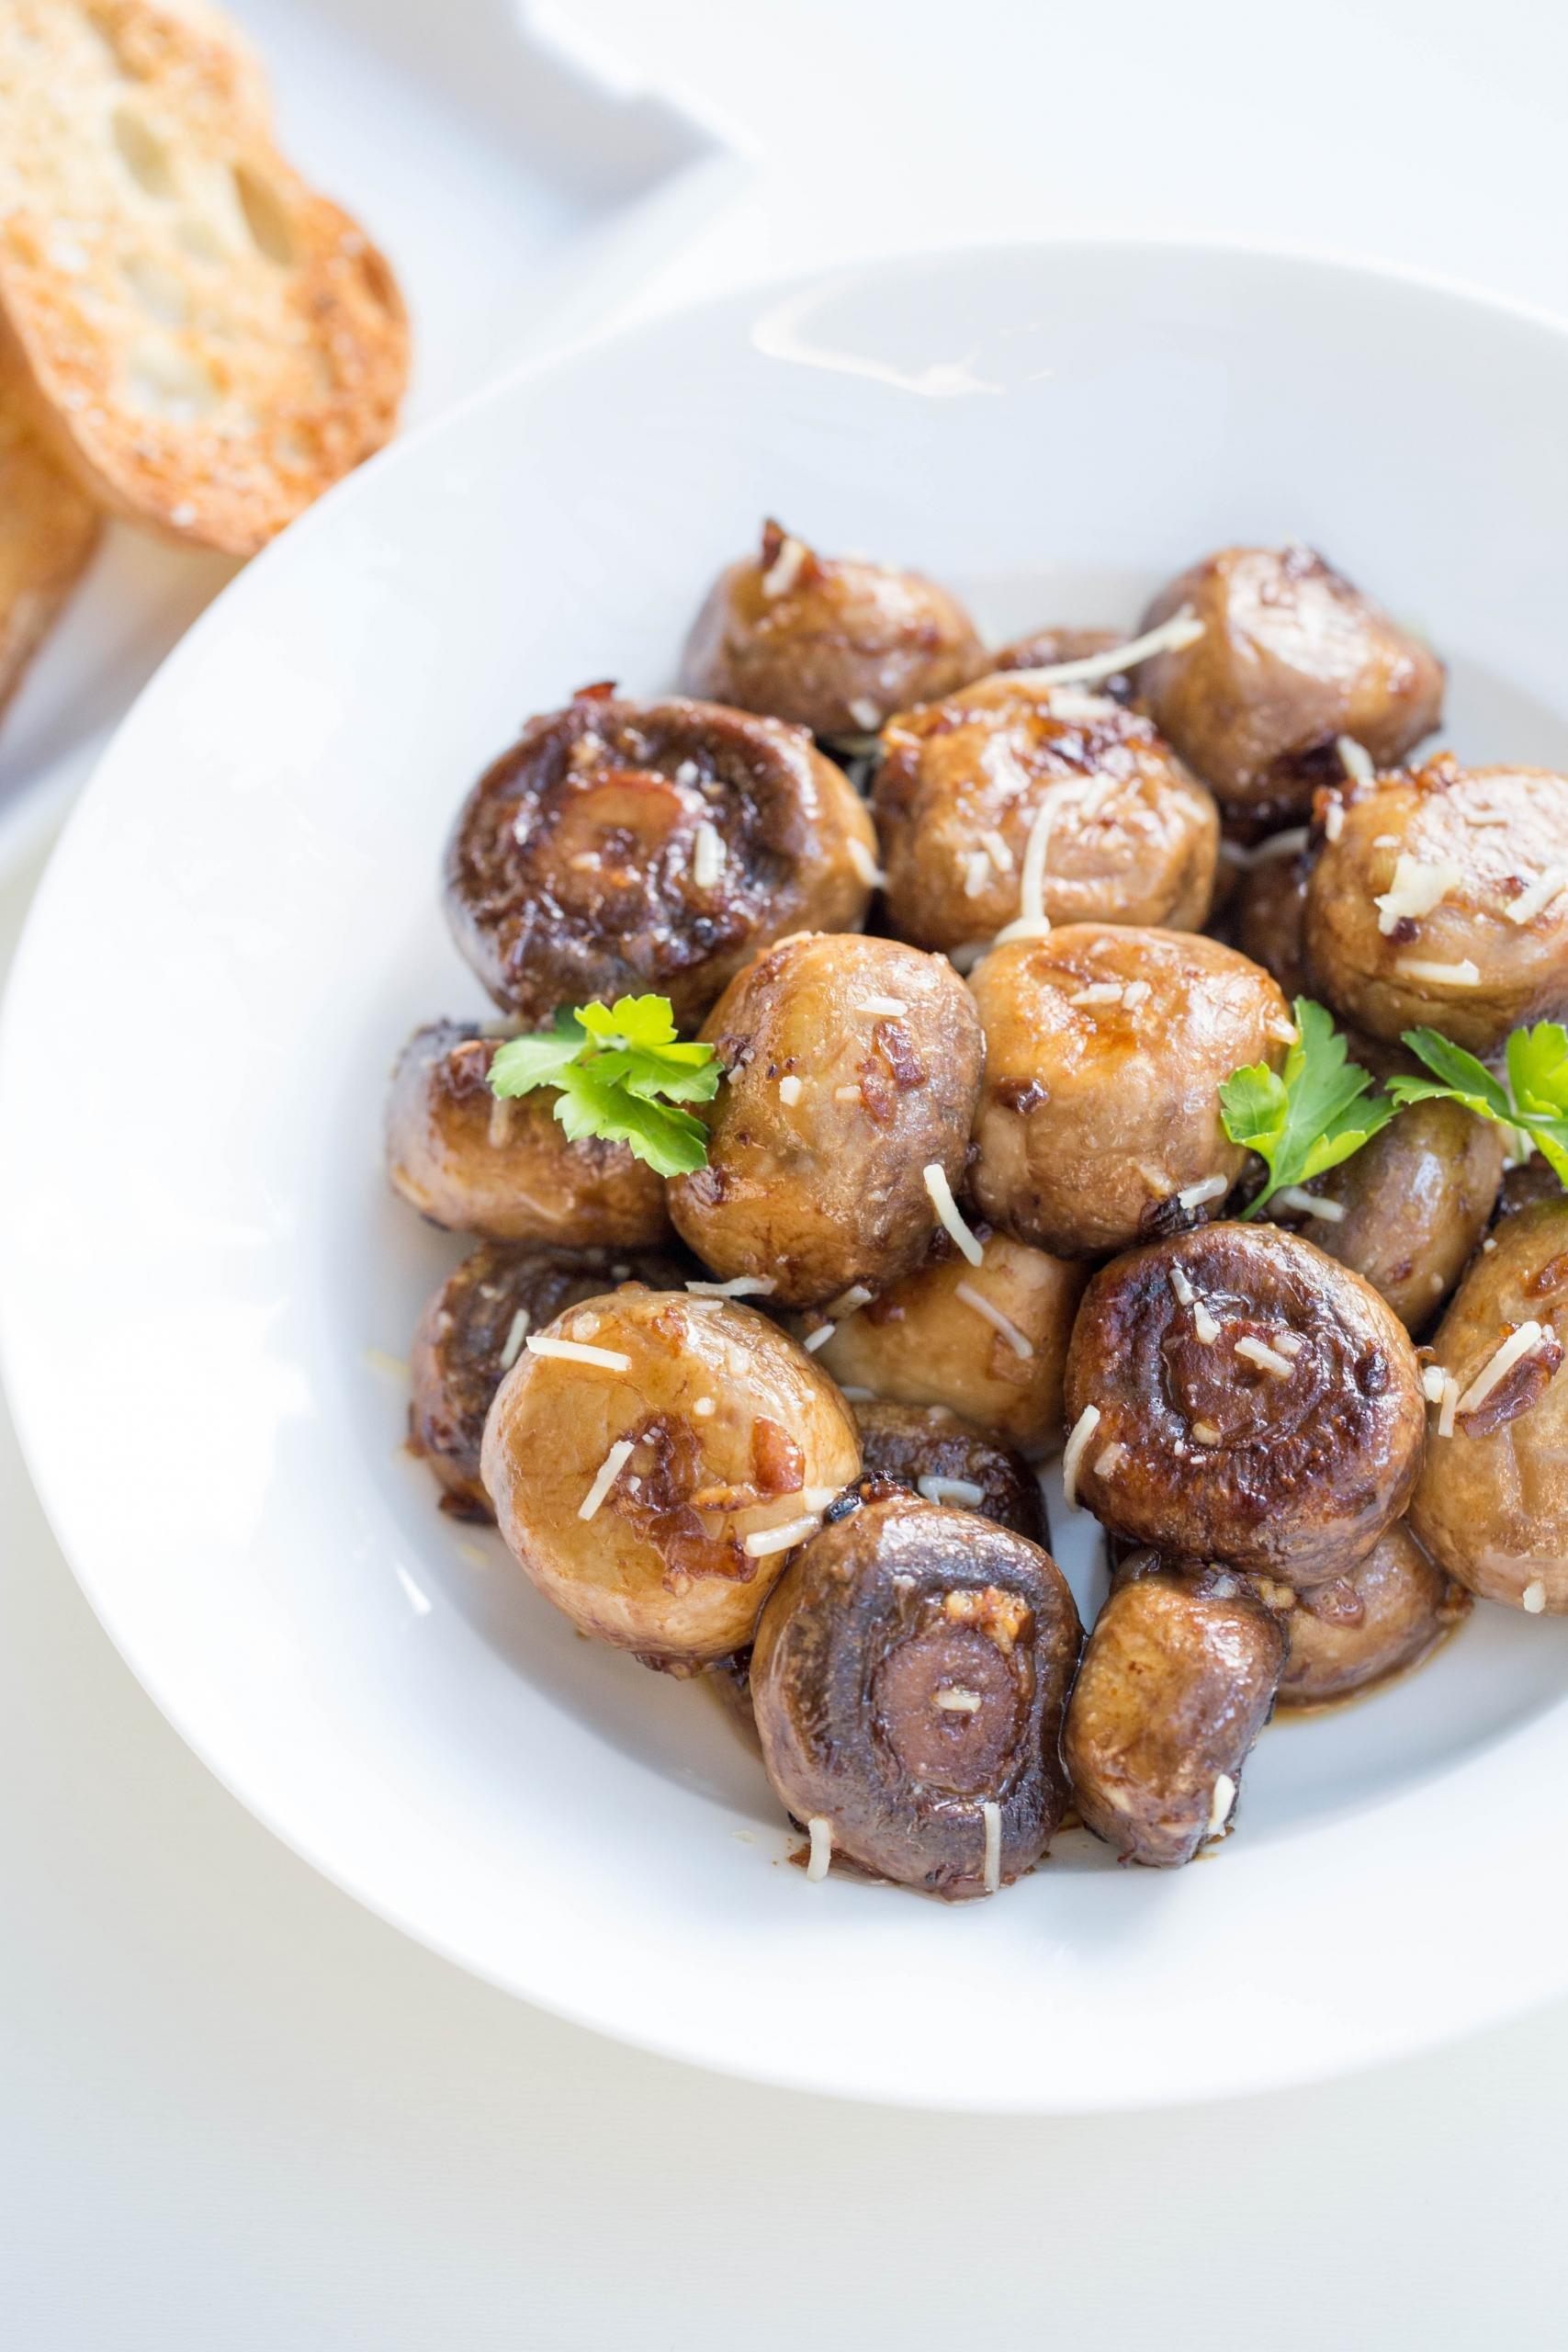 Sautéed Mushroom Appetizer in a bowl